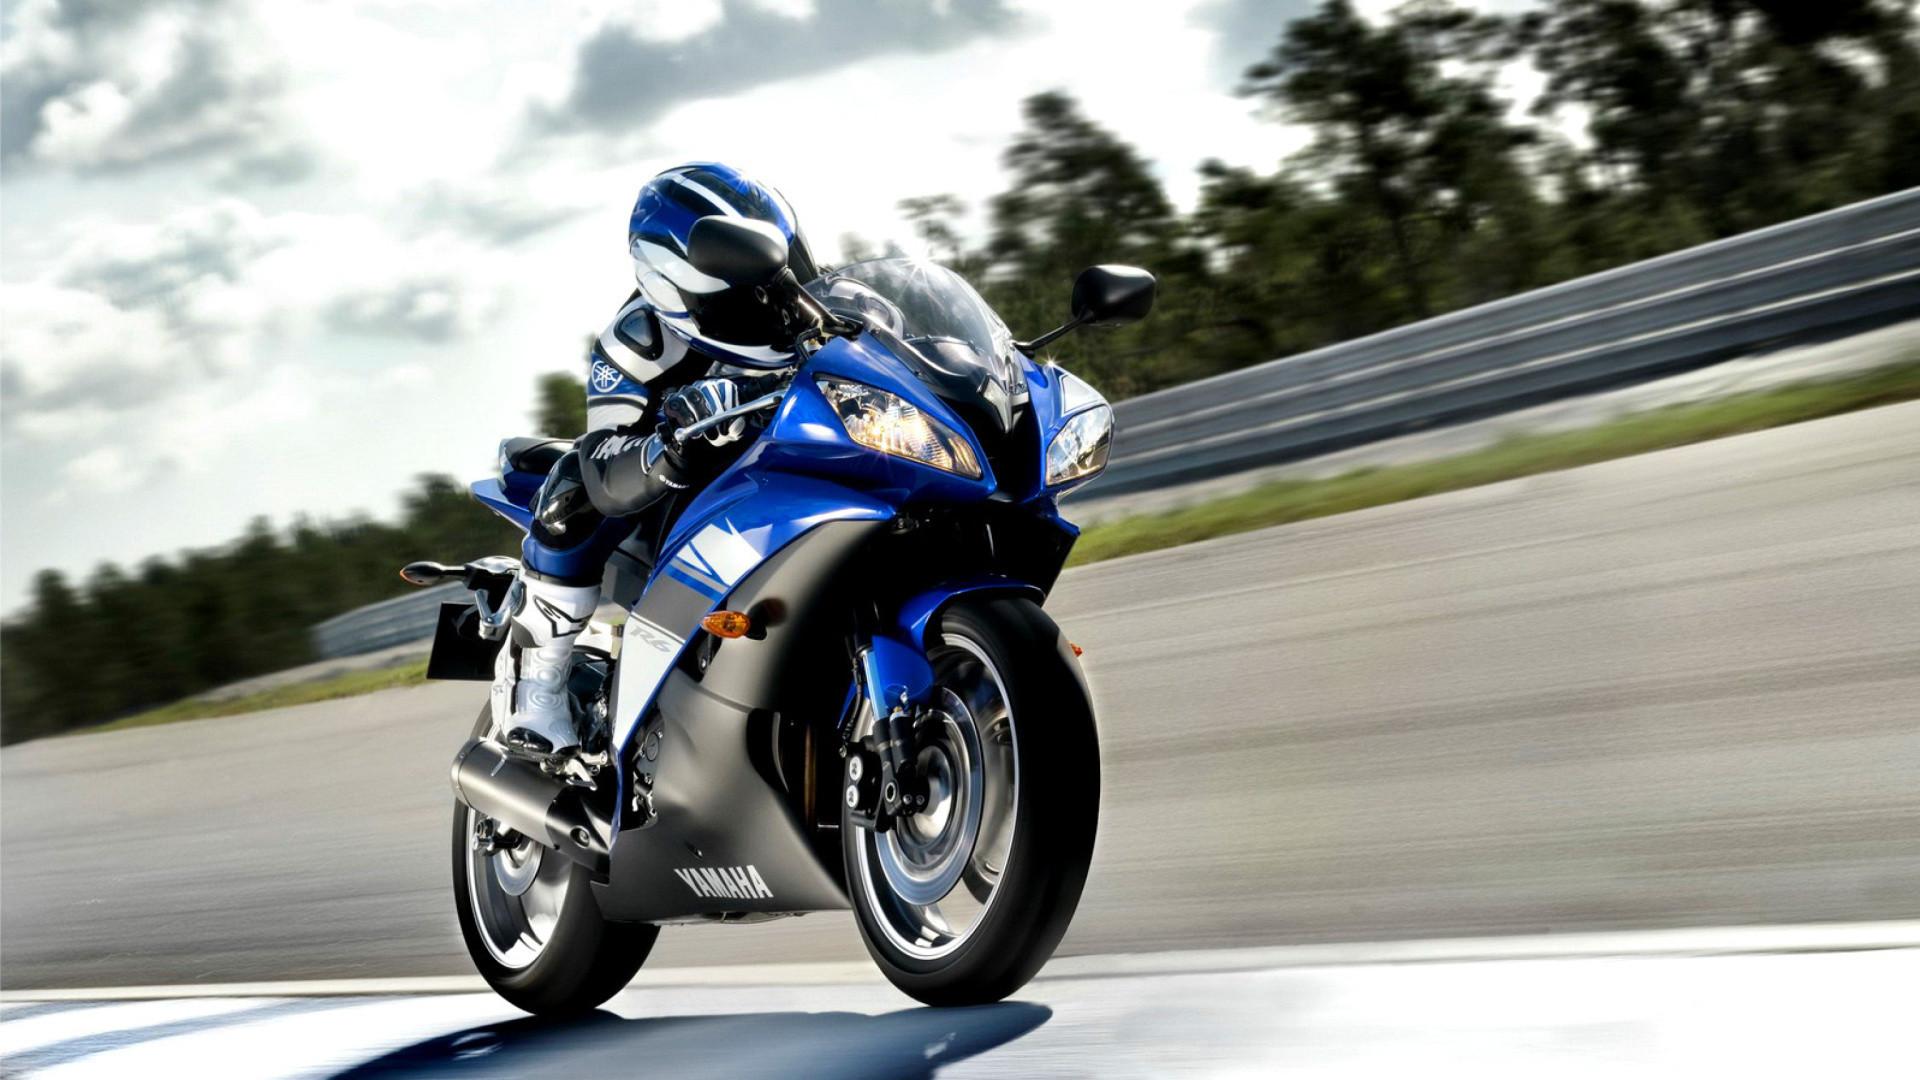 Yamaha R6 Superbike Wallpaper for Desktop Full HD